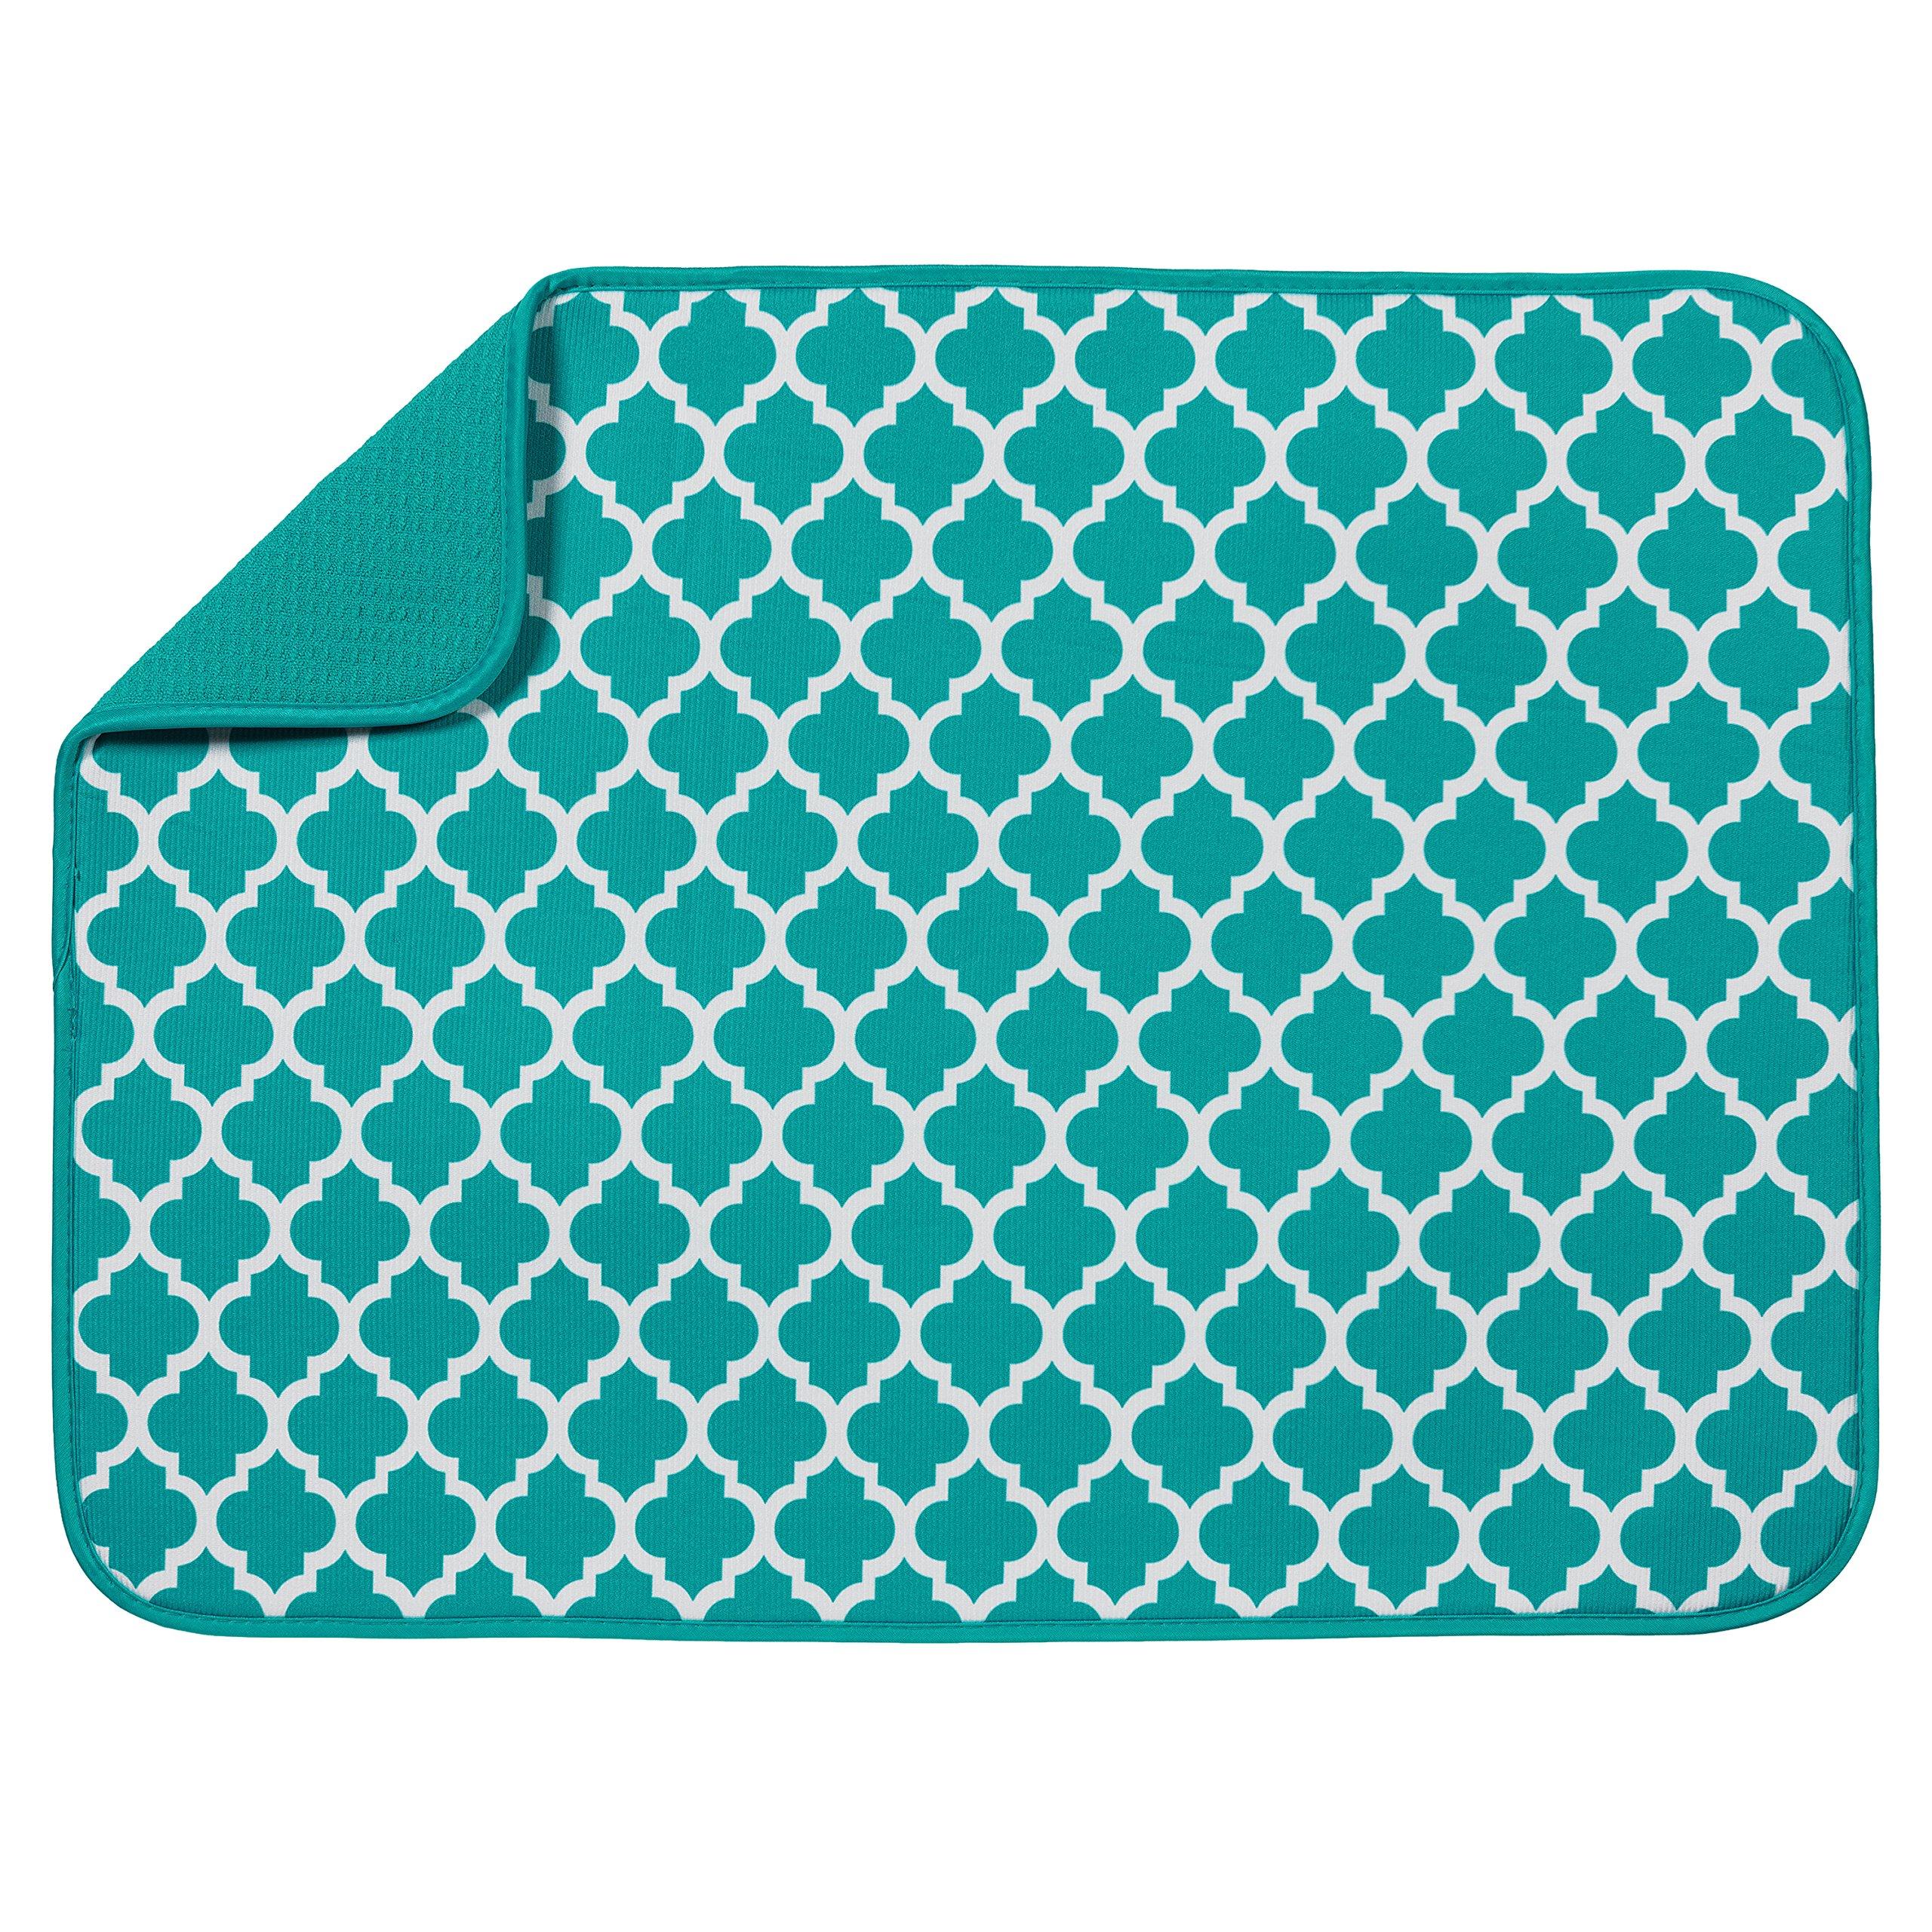 S&T XL Microfiber Dish Drying Mat, 18'' x 24'', Teal Trellis